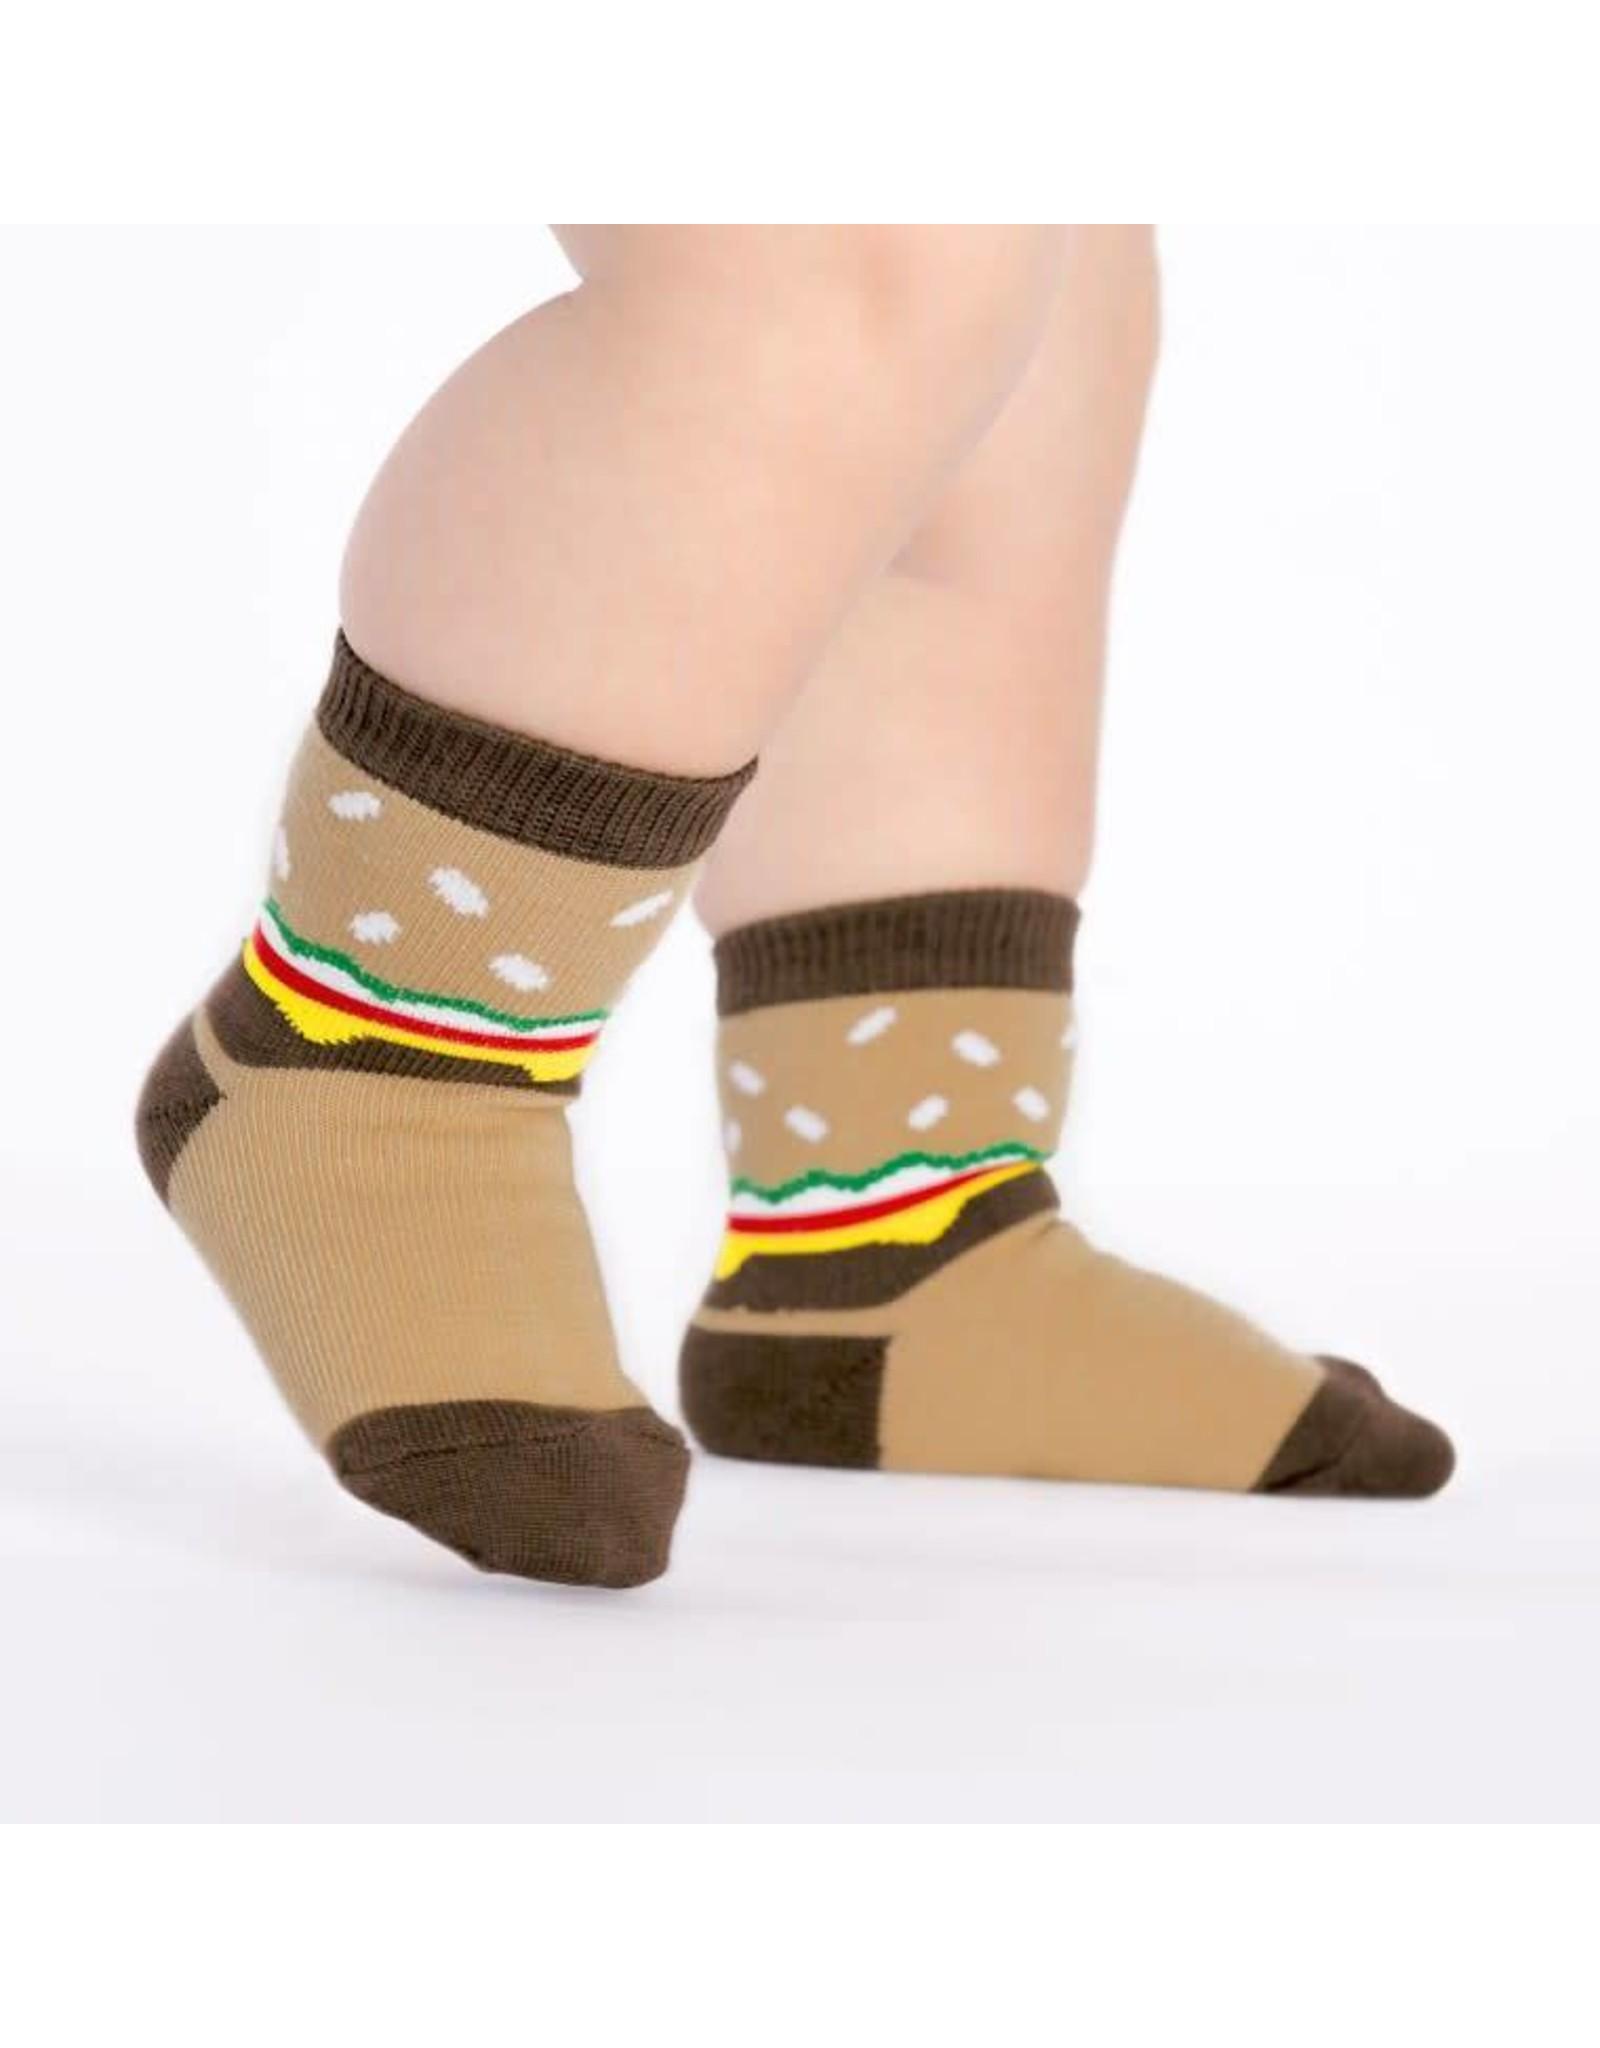 SOCK IT TO ME - Toddler Cheeseburger Socks